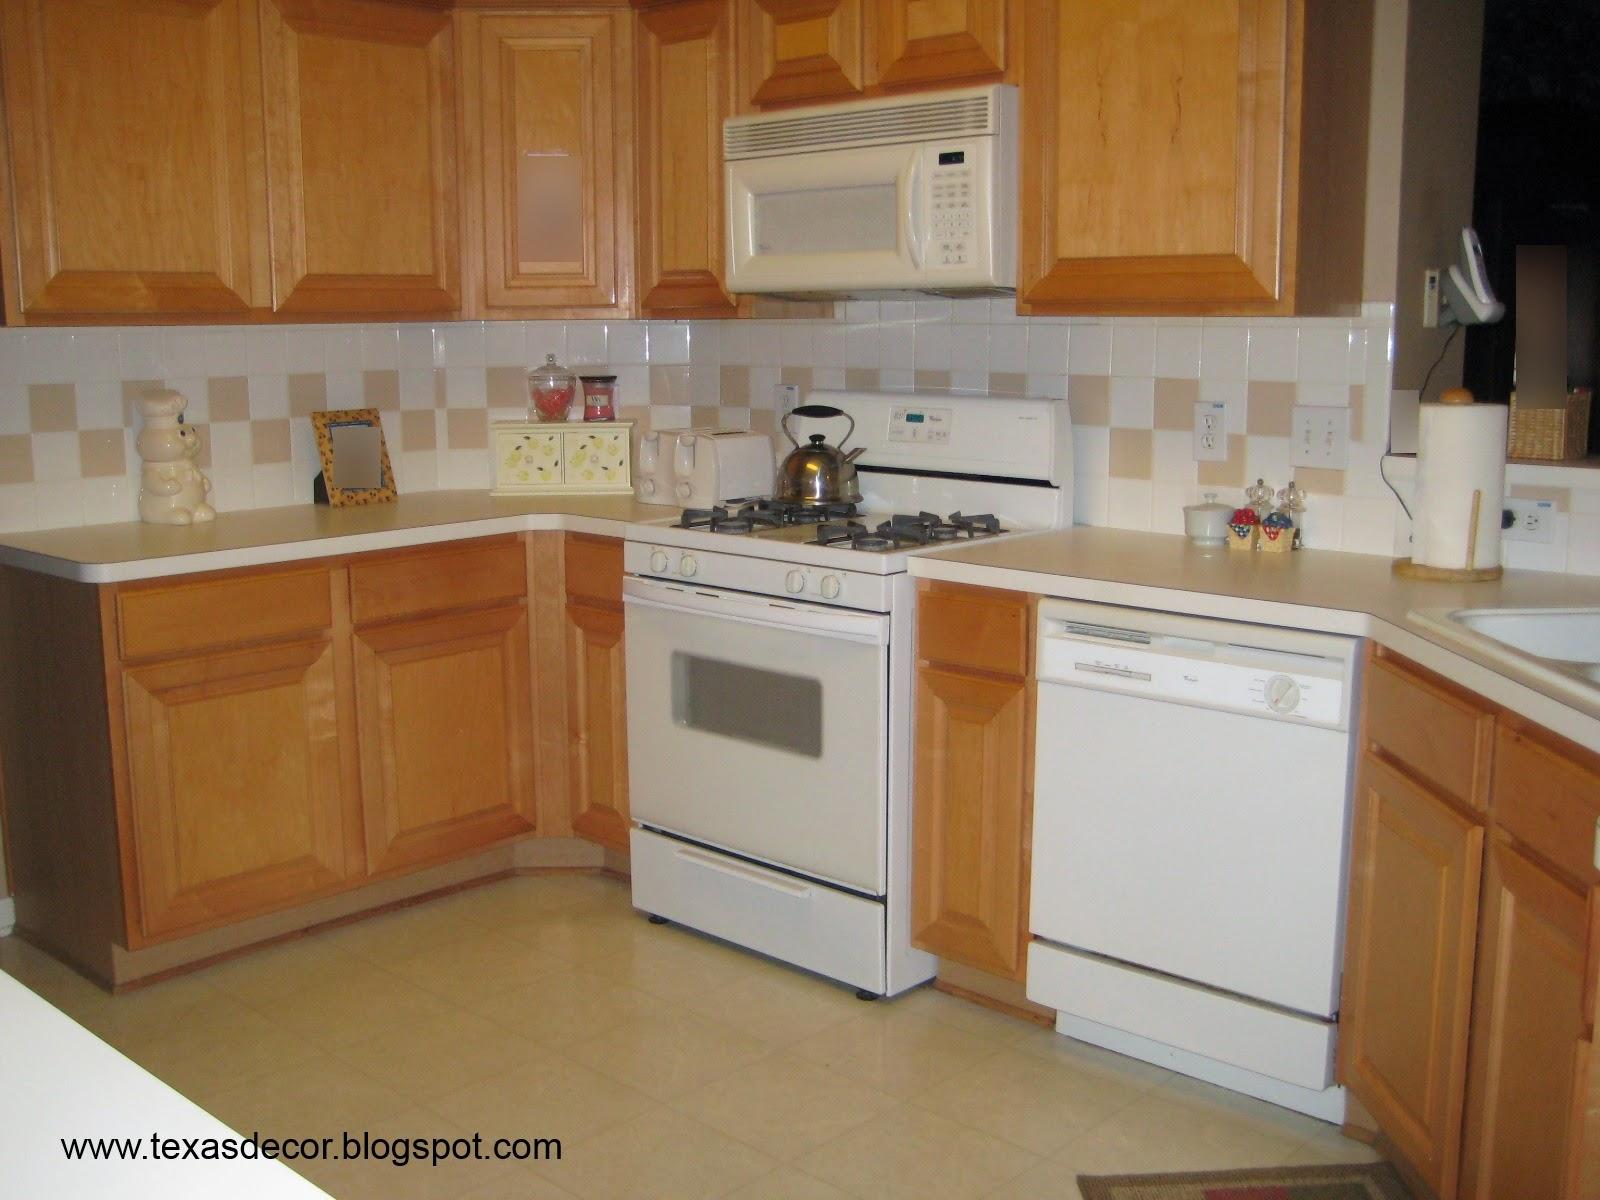 Http Texasdecor Blogspot Ca 2014 06 Painted Kitchen Cabinet Reveal Html